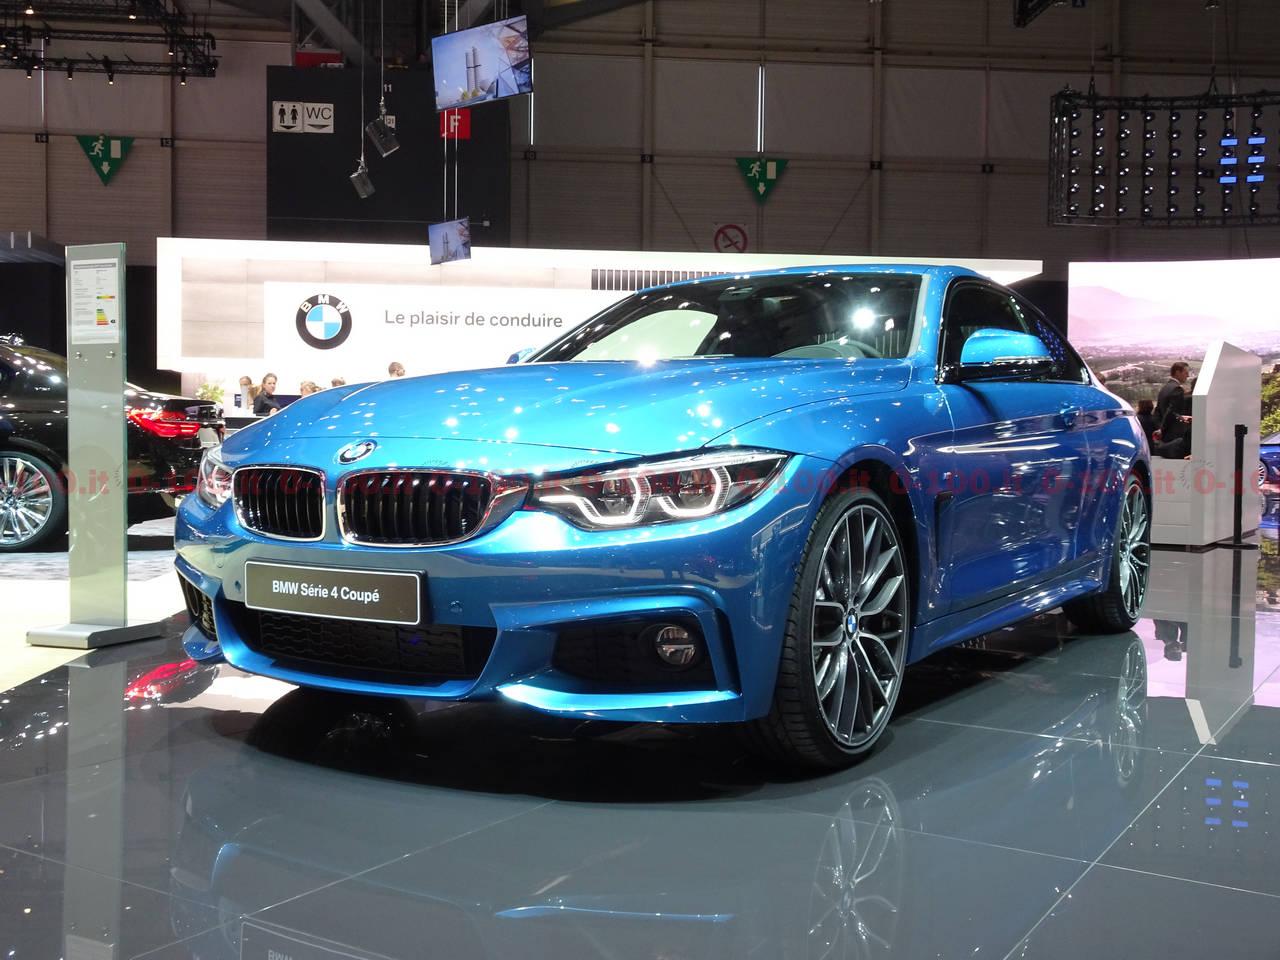 Ginevra-geneva-geneve-2017-BMW_Serie-4_0-100_4